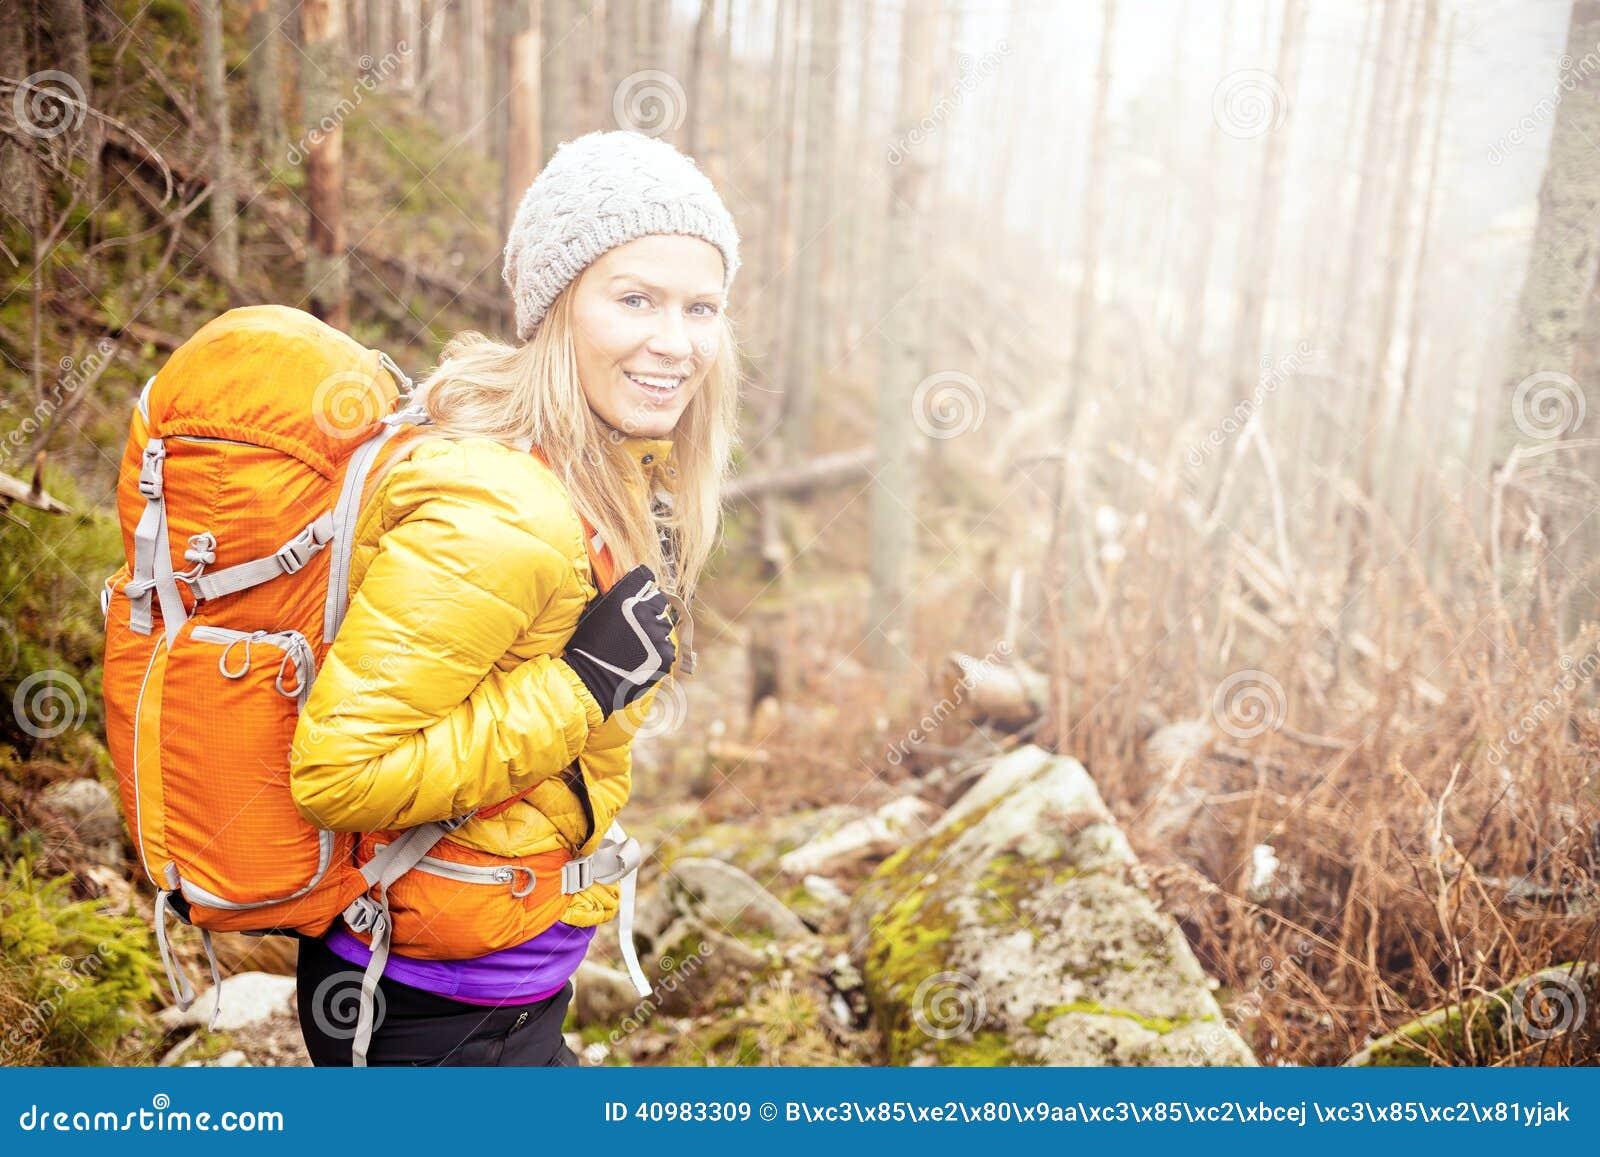 Woman Hiking Stock Image